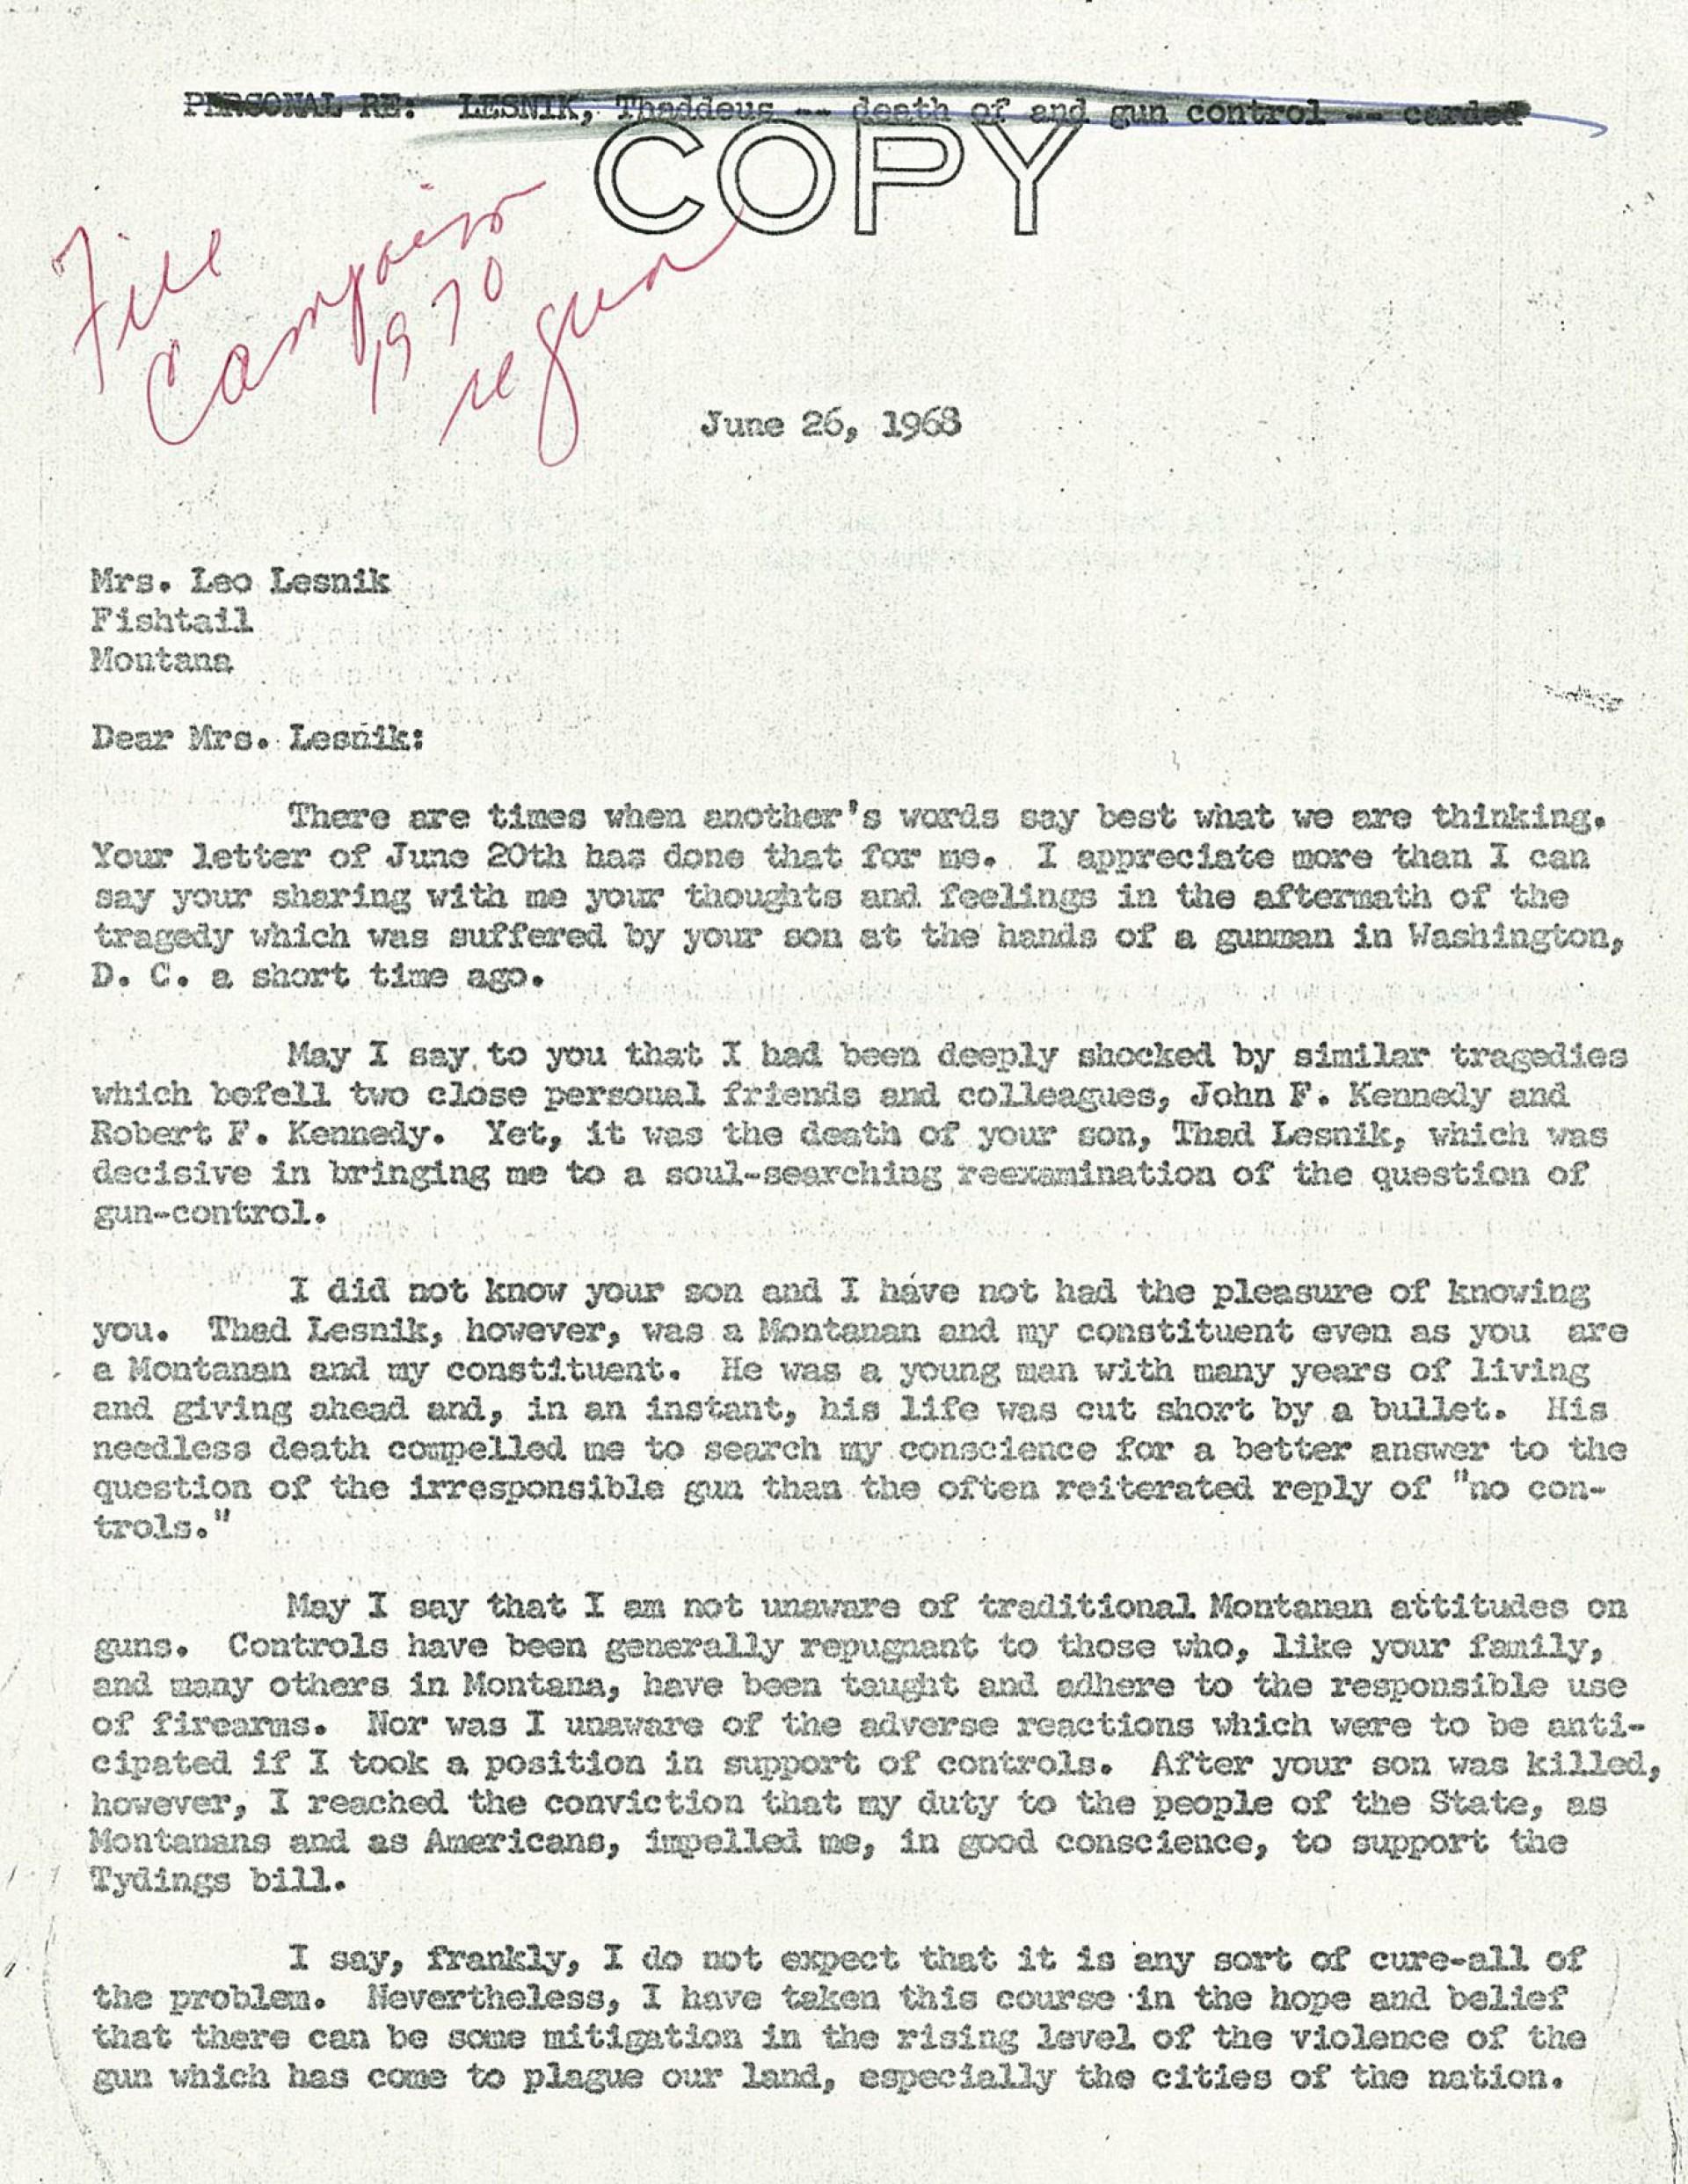 004 Gun Control Argumentative Essay Pro Essays Concl Outline Pdf Introduction Conclusion Topics Thesis Anti Against On Incredible Laws 1920